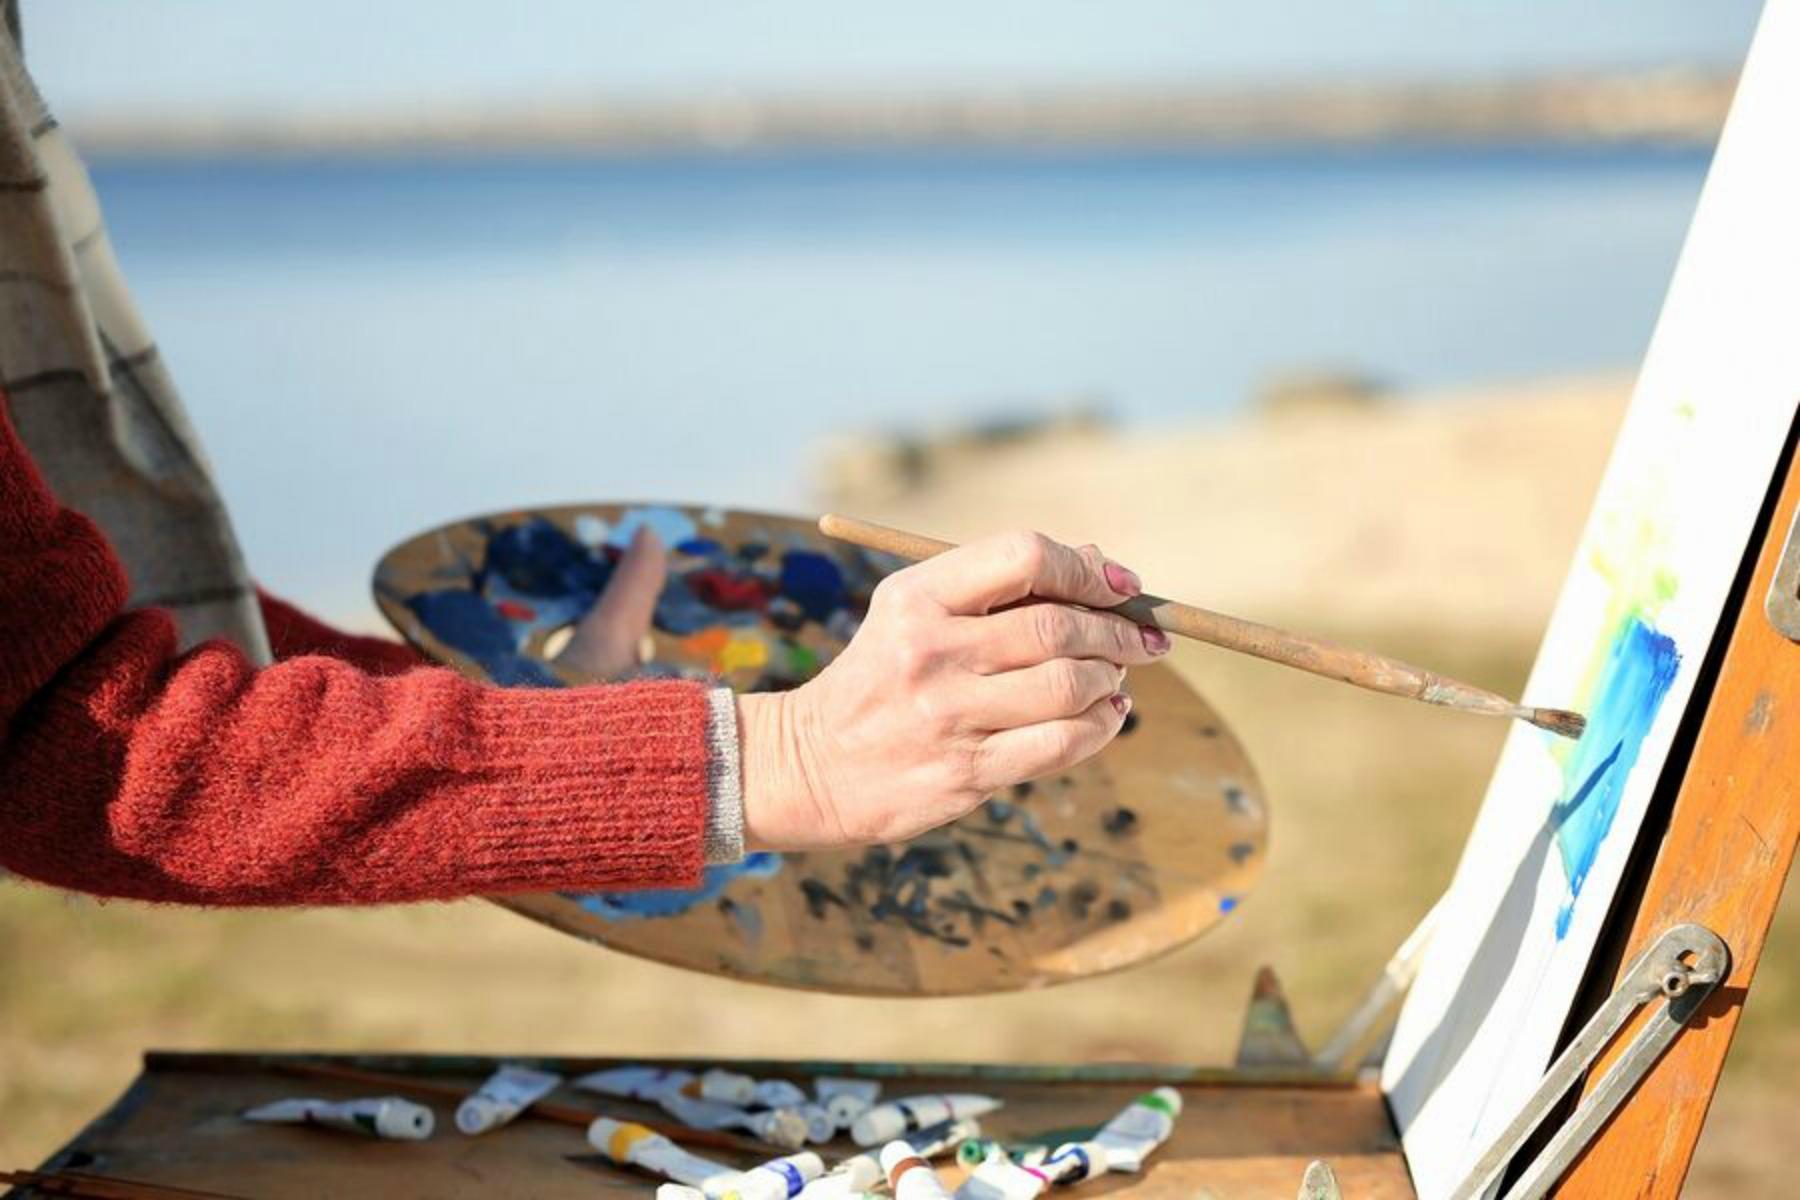 Home Care in Goodyear AZ: Helped Hattie Paint Again